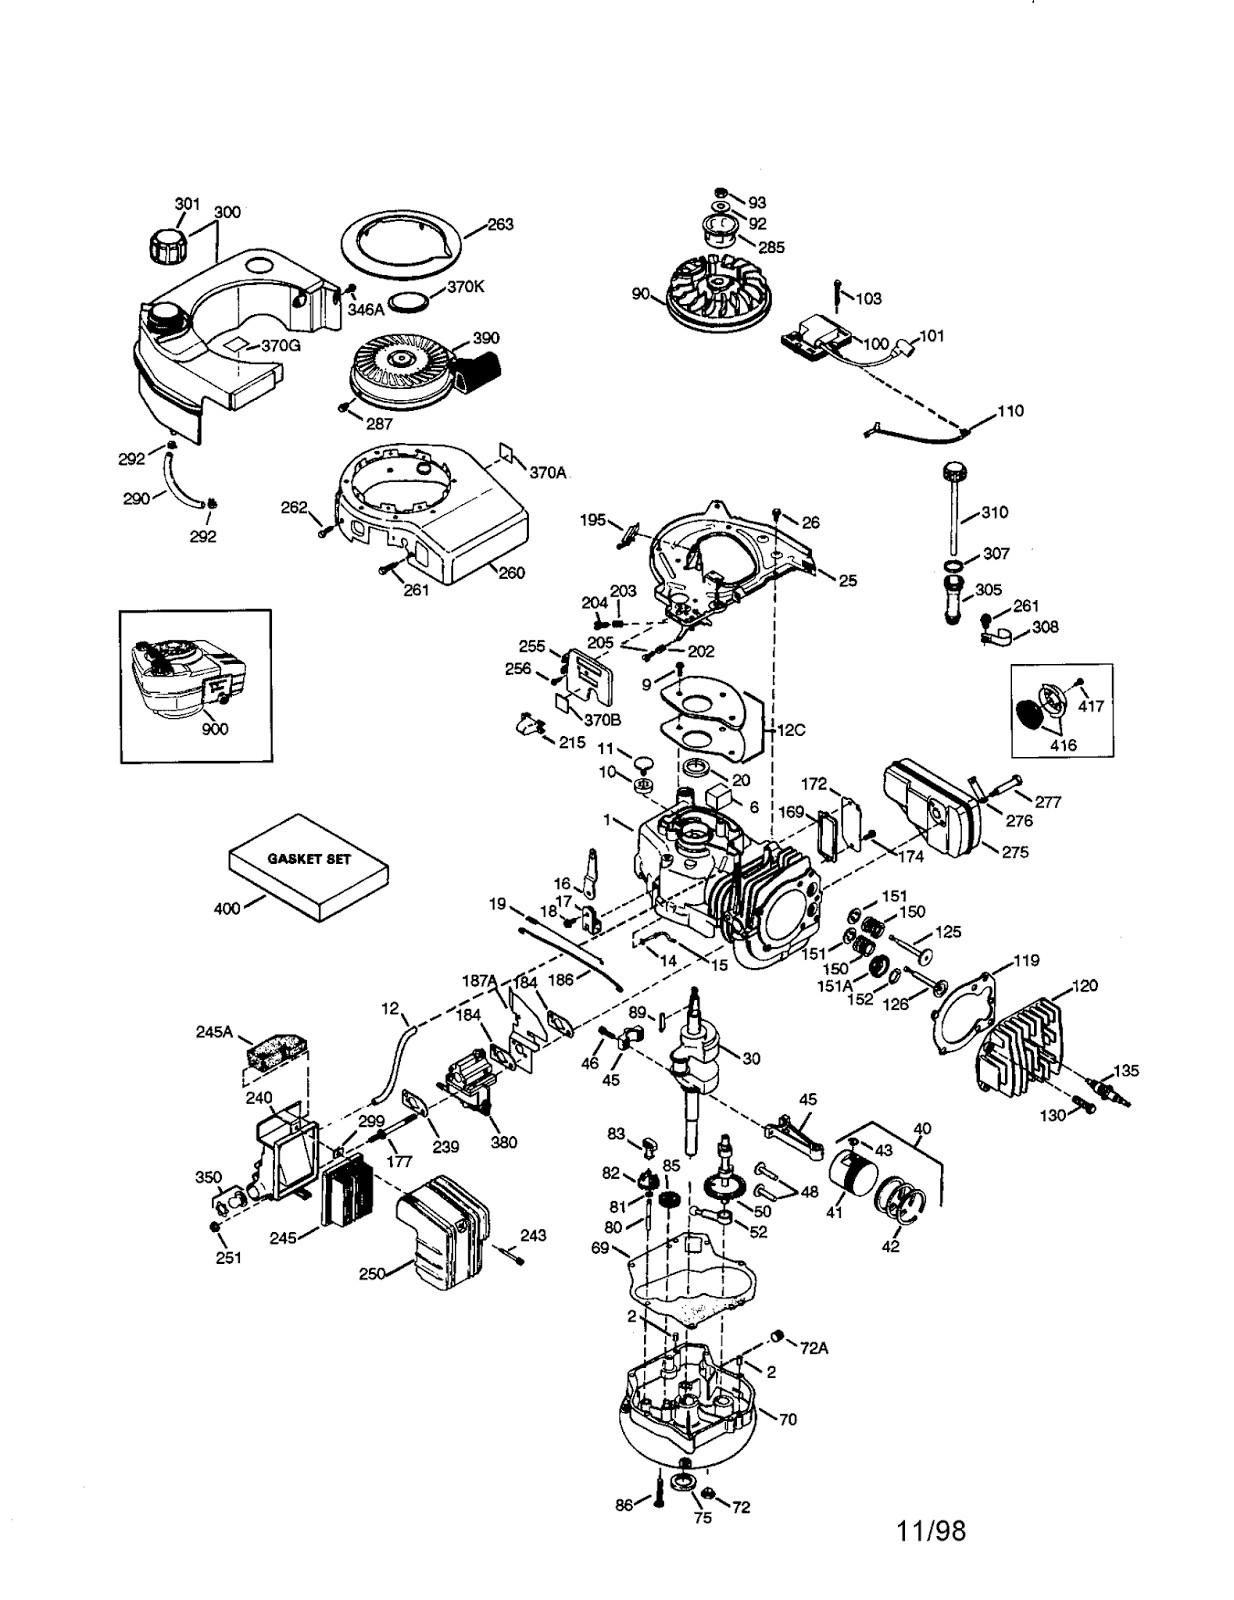 Honda gx390 parts diagram free service repair manual tecumseh engine parts diagram of honda gx390 parts